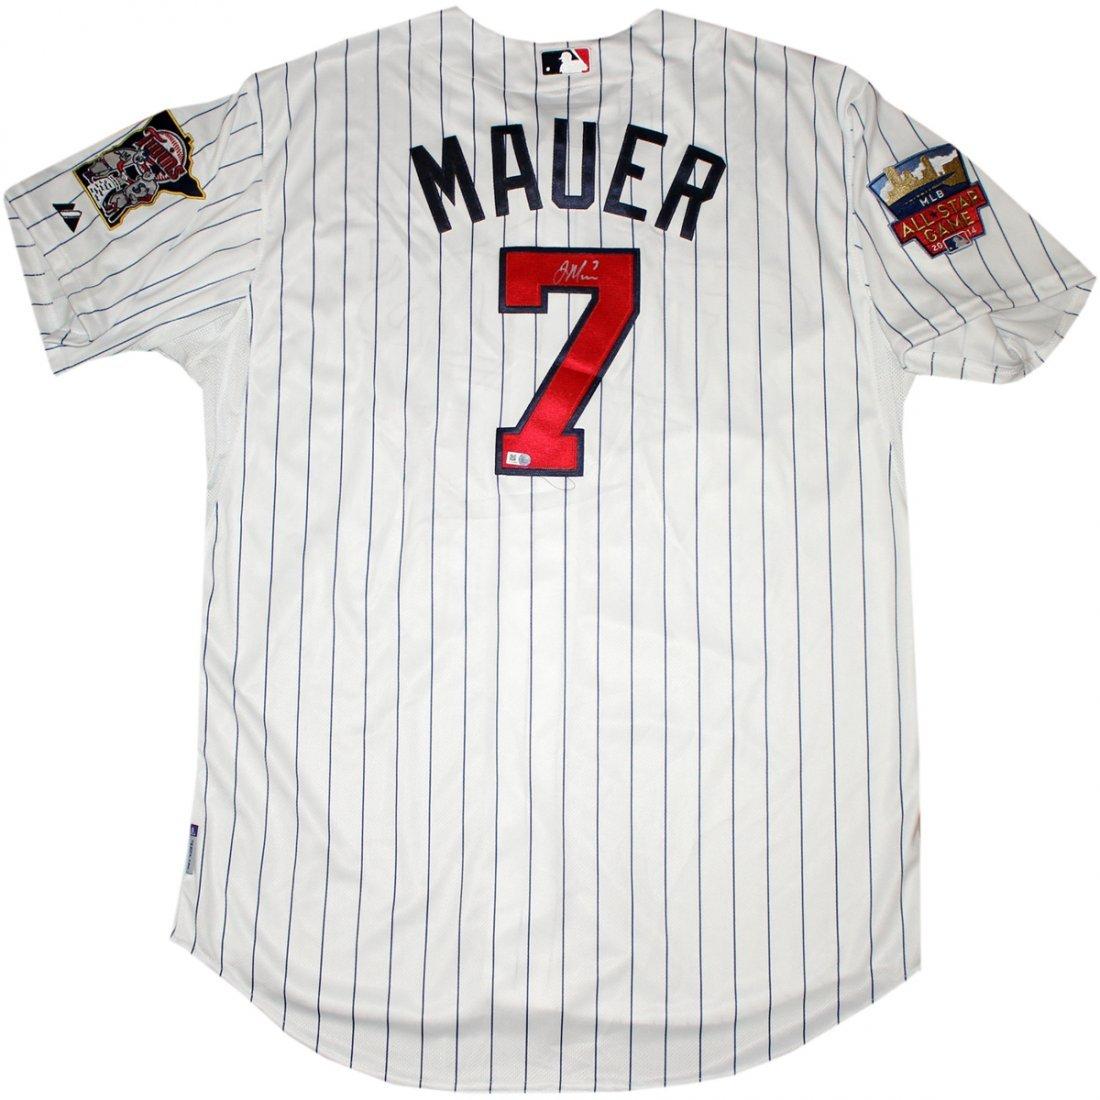 Joe Mauer Signed Minnesota Twins Authentic Home Jersey